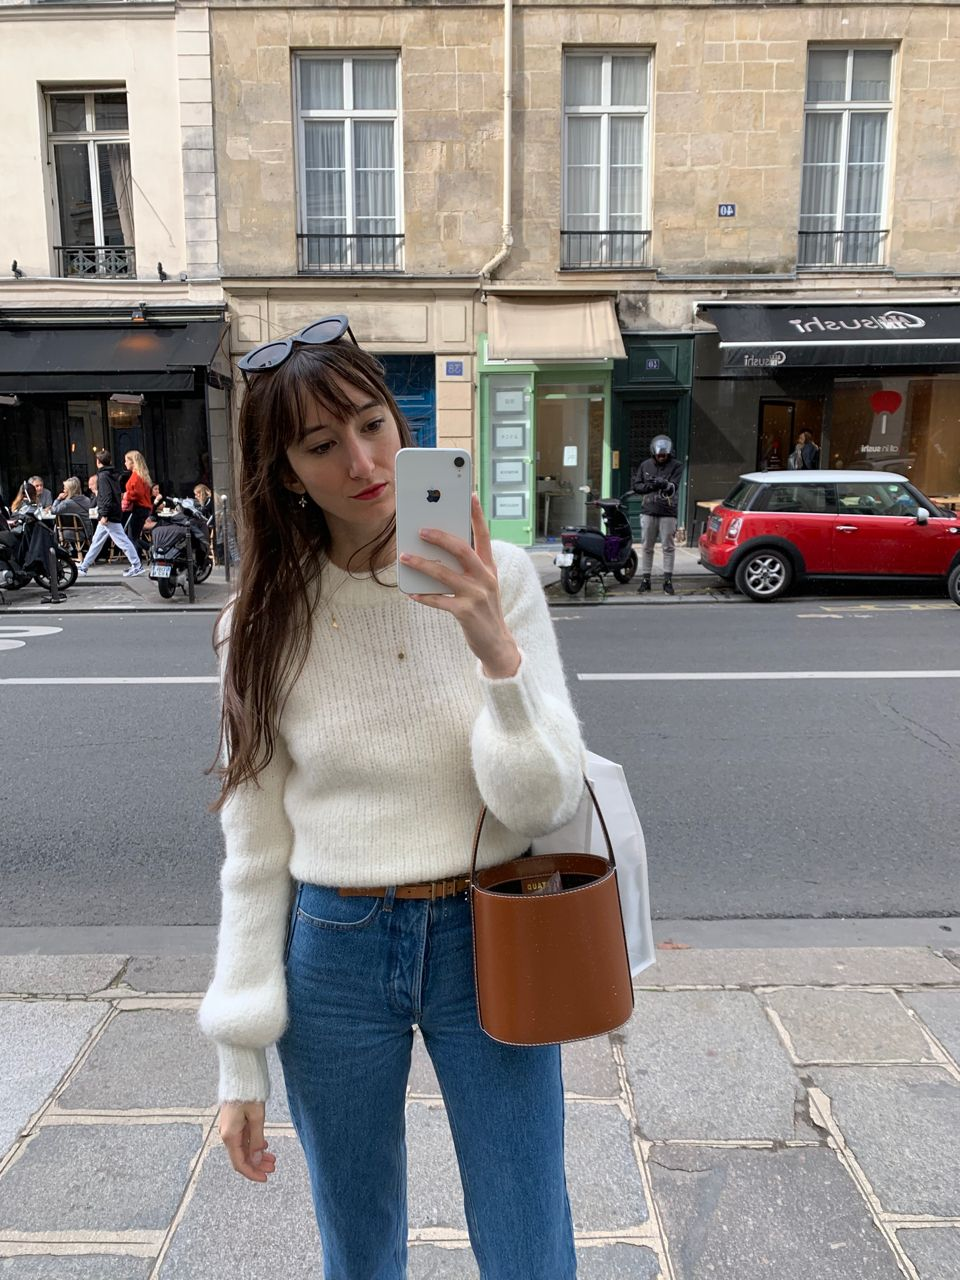 Early Fall Parisian Looks - Samsoe Samsoe